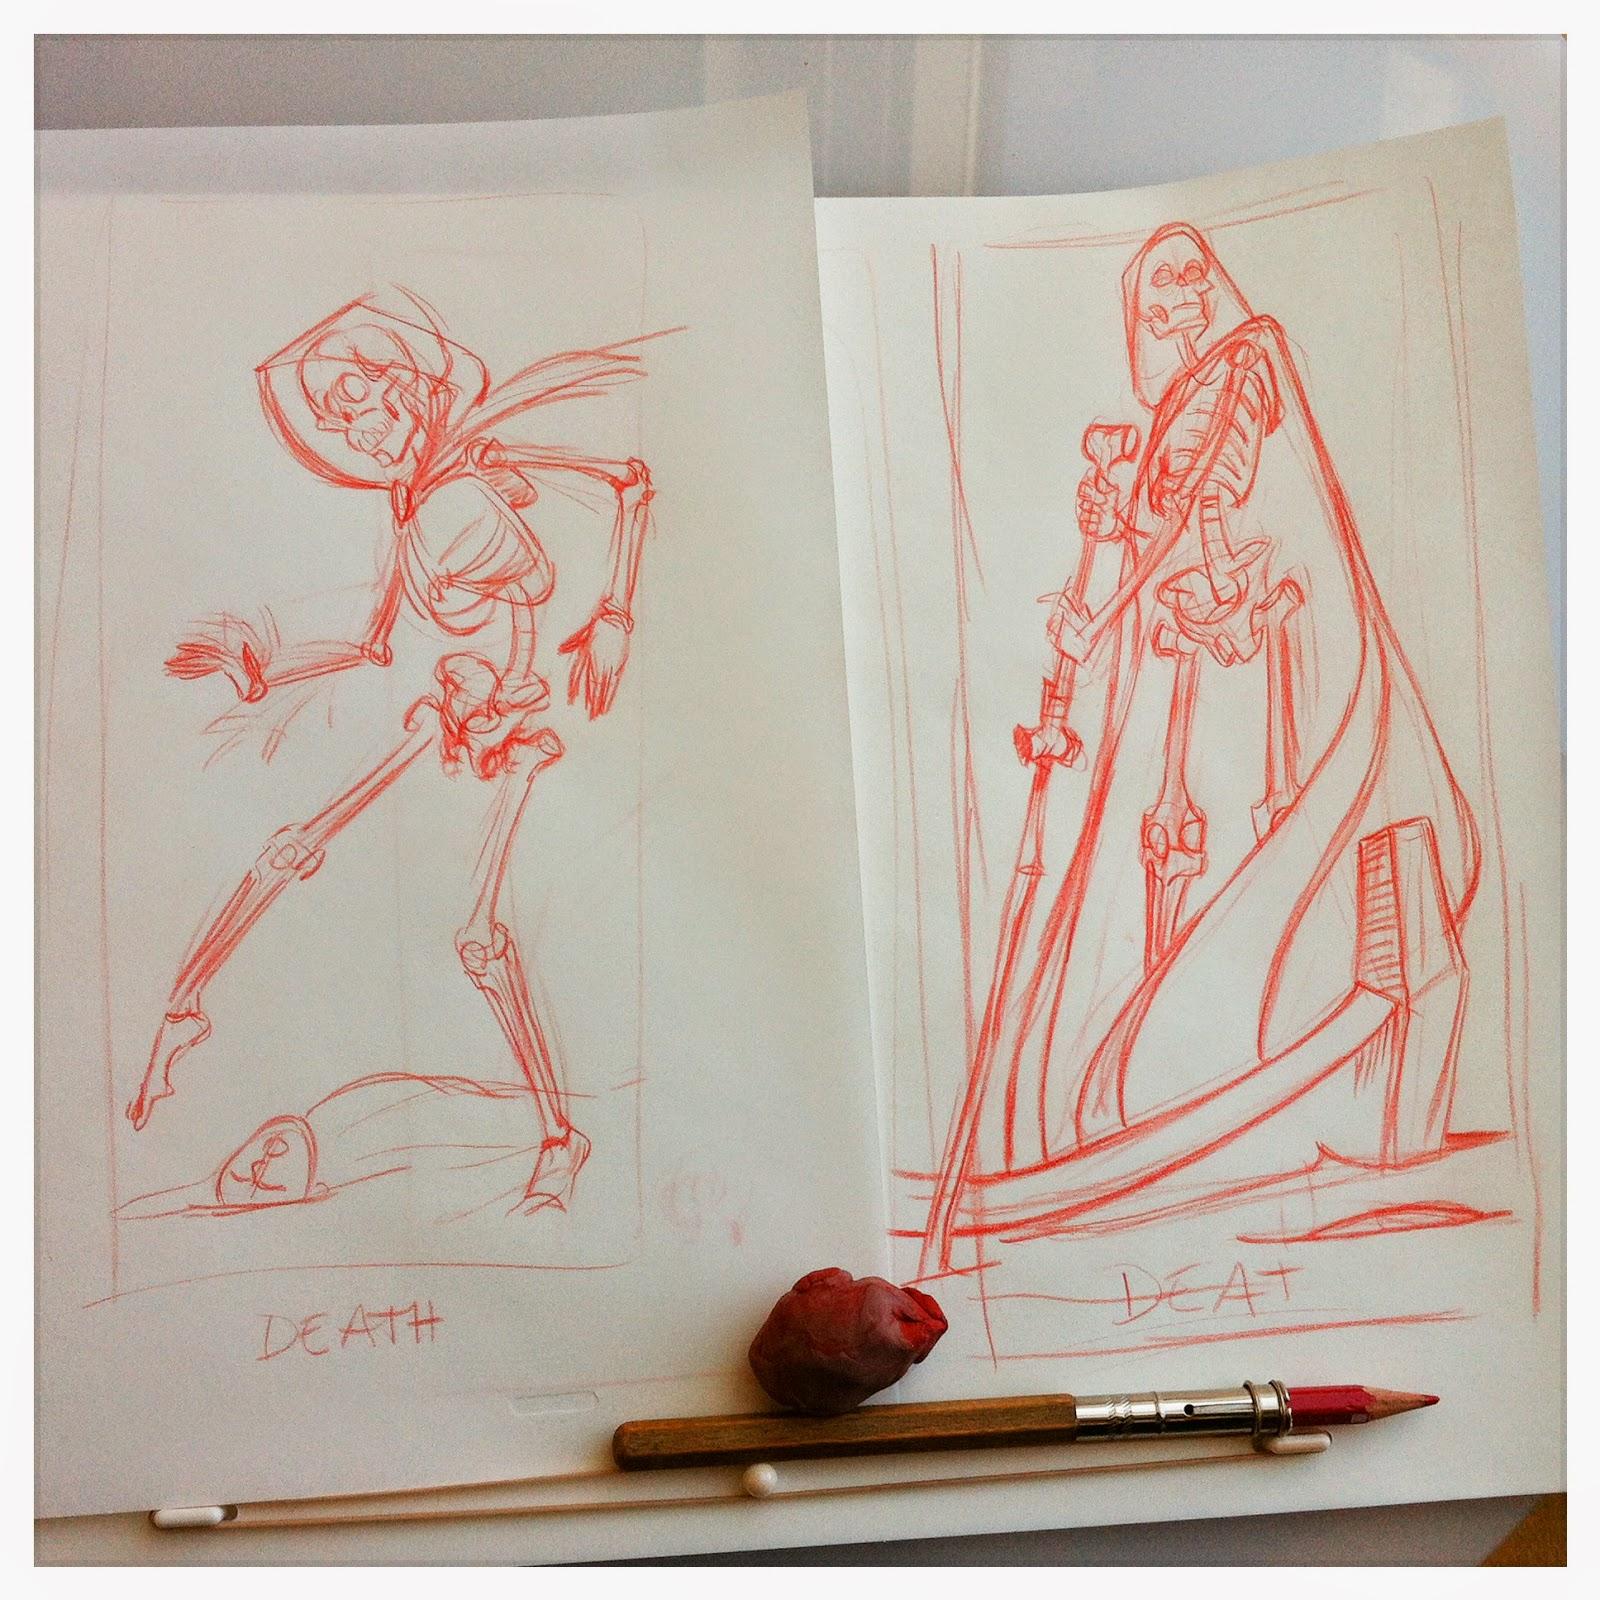 Death - tarot card concept sketch (in the style of Marseille tarot) - Cesare Asaro - Curio & Co. Curio and Co. OG - curioandco.com